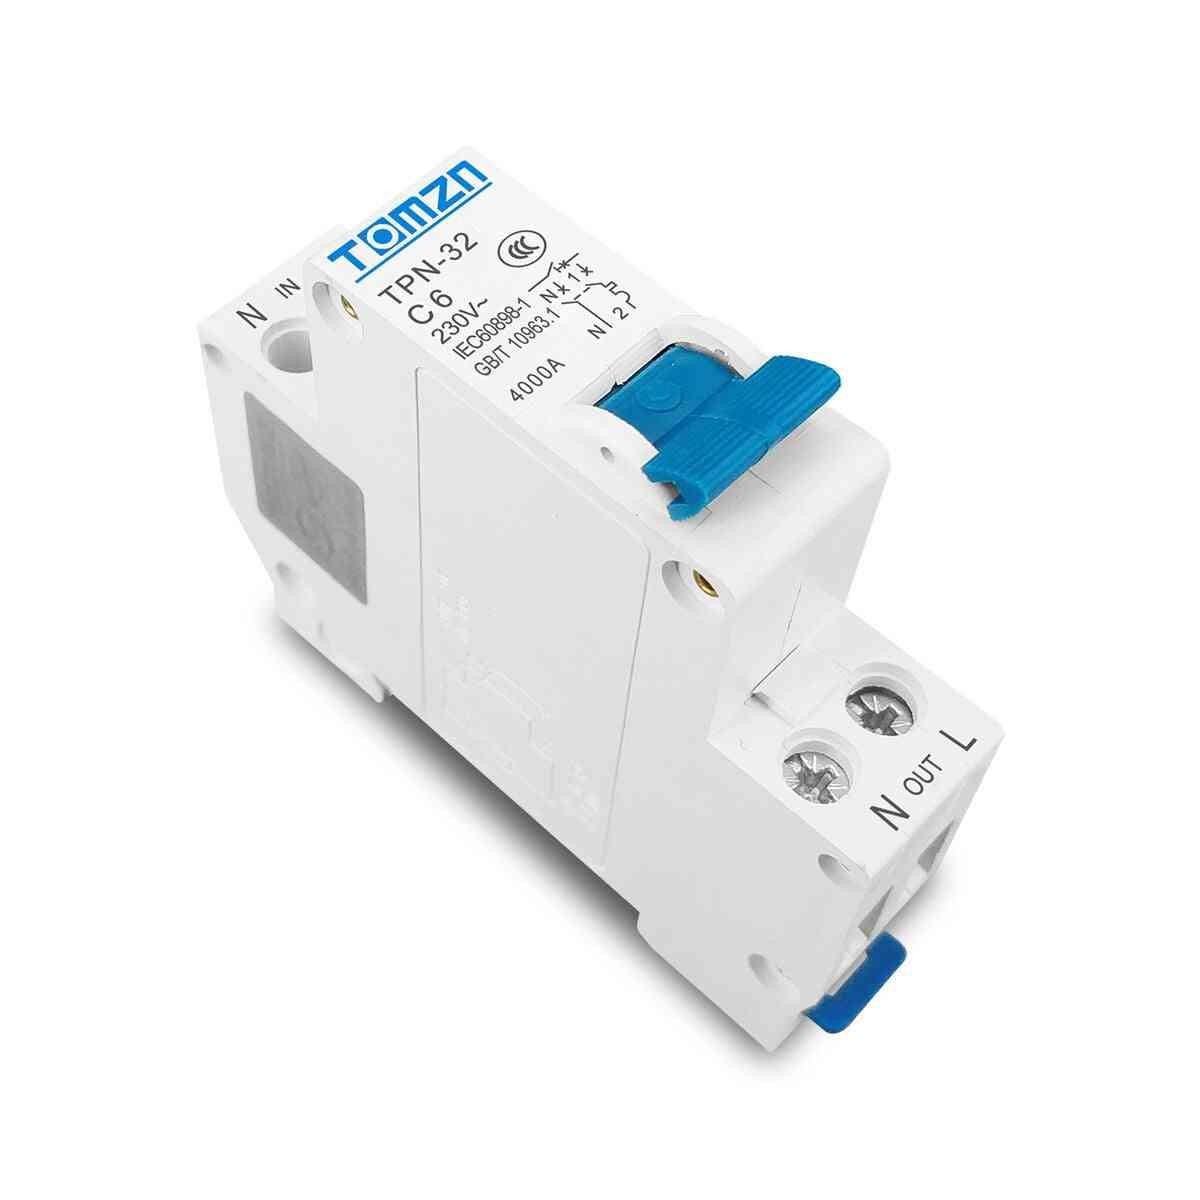 Mini Circuit Breaker Mcb 6a 10a 32a Din Rail Mounting Miniature Household Air Switch